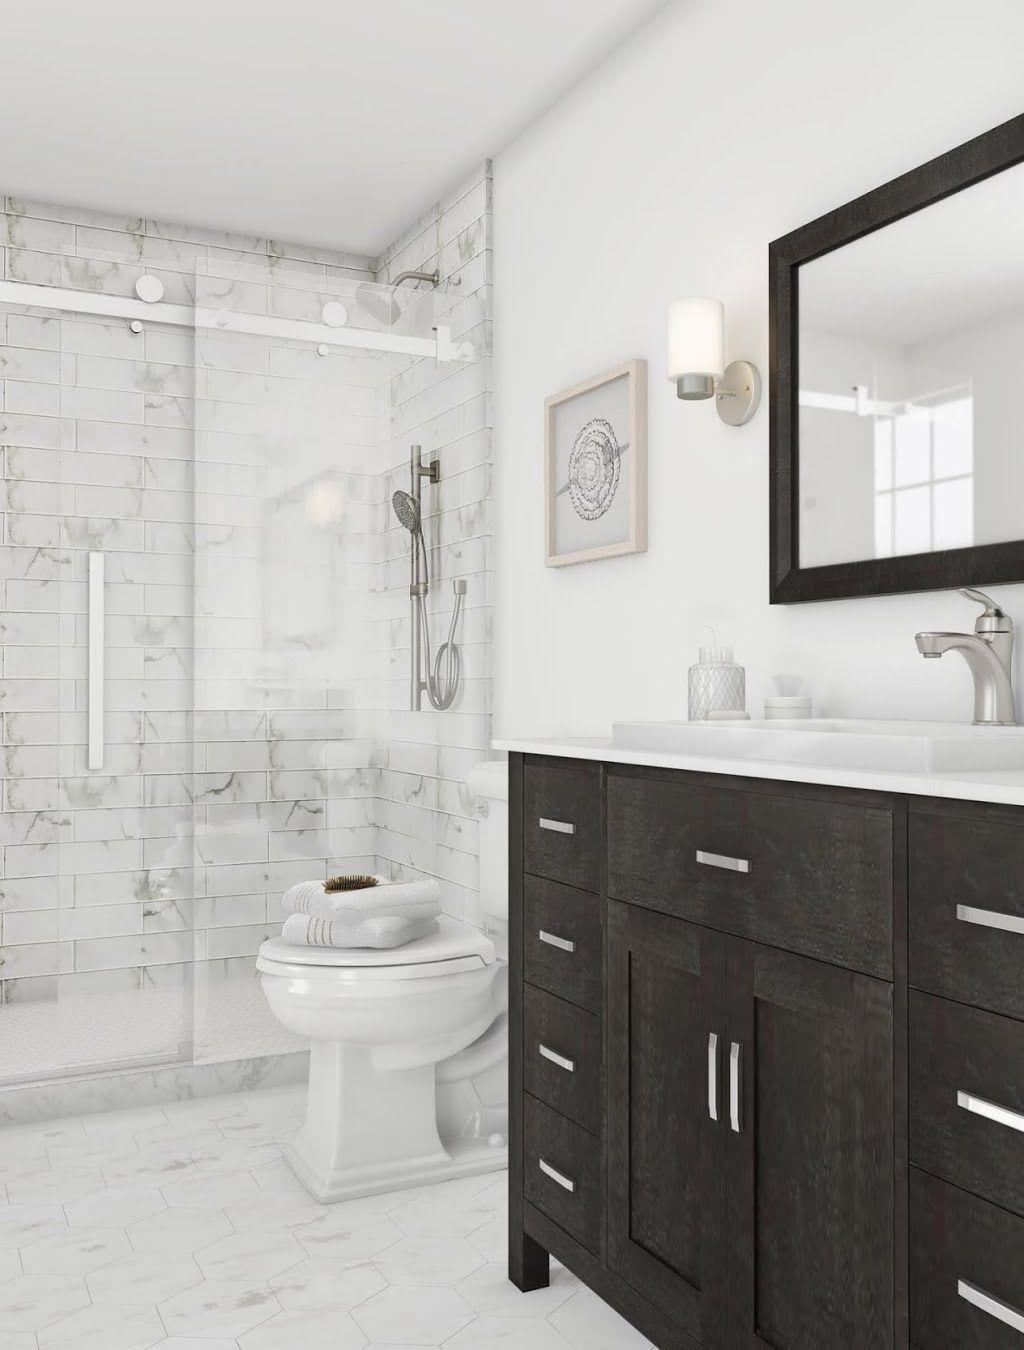 Msi Marmi Blanco White 4 In X 16 In Glazed Ceramic Wall Tile 11 Sq Ft Case Nhdmarbla4x16 Bathroom Trends Bathrooms Remodel Bathroom Interior Design